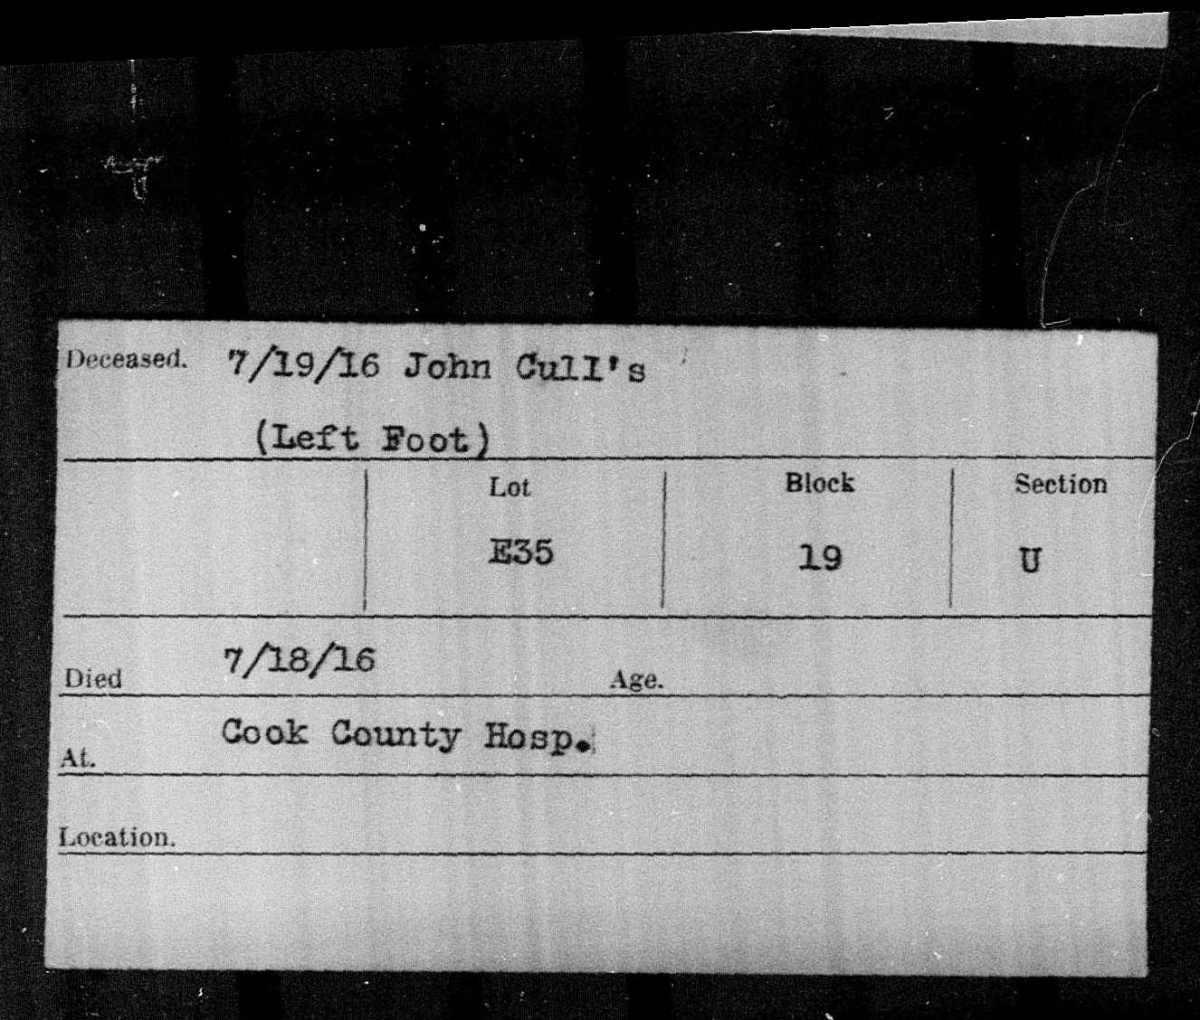 Burial Cards: John's leftfoot